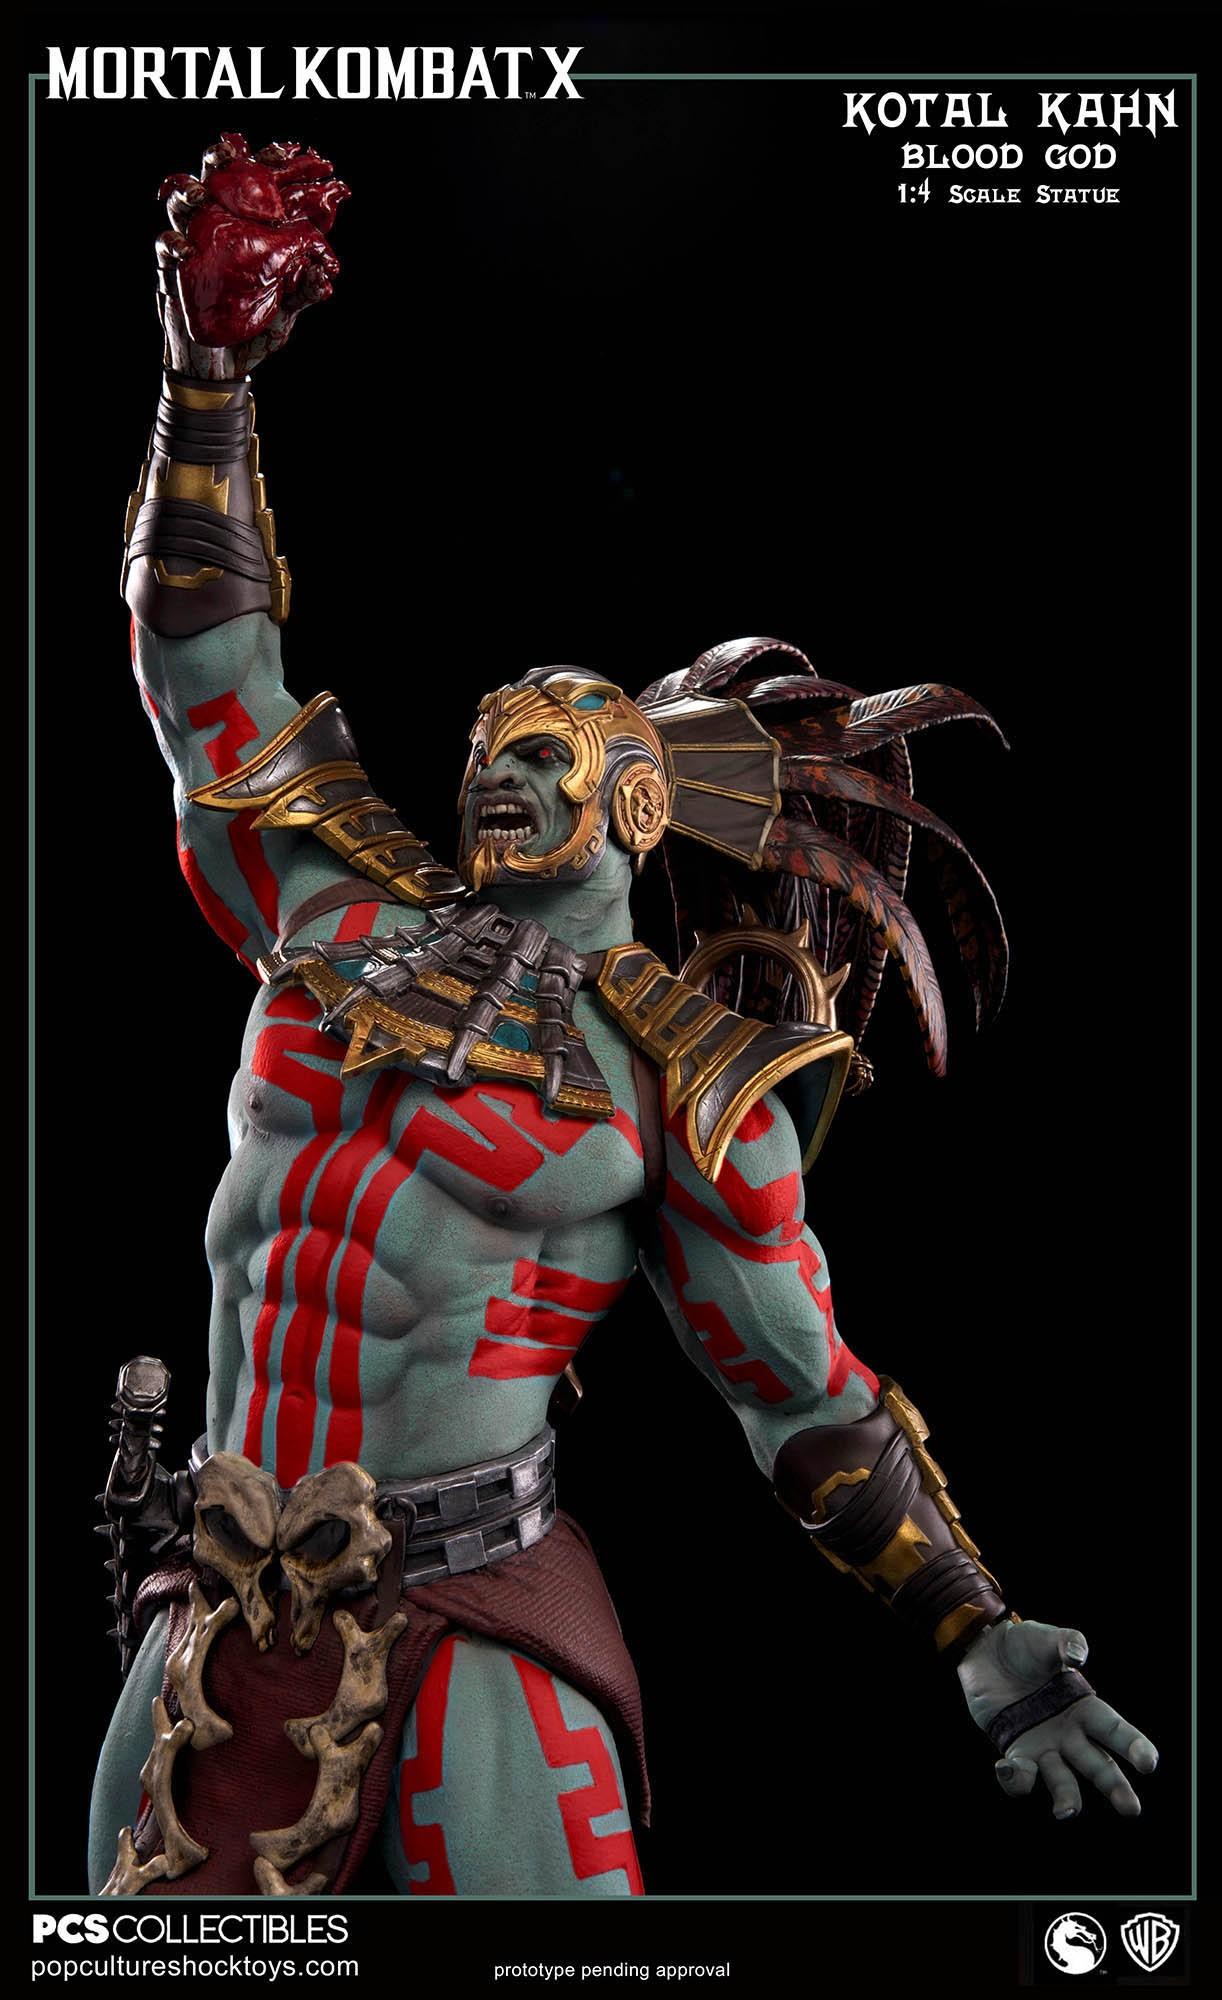 [Pop Culture Shock] Mortal Kombat X: Kotal Kahn 1:4 scale PCS-Kotal-Kahn-Blood-God-012